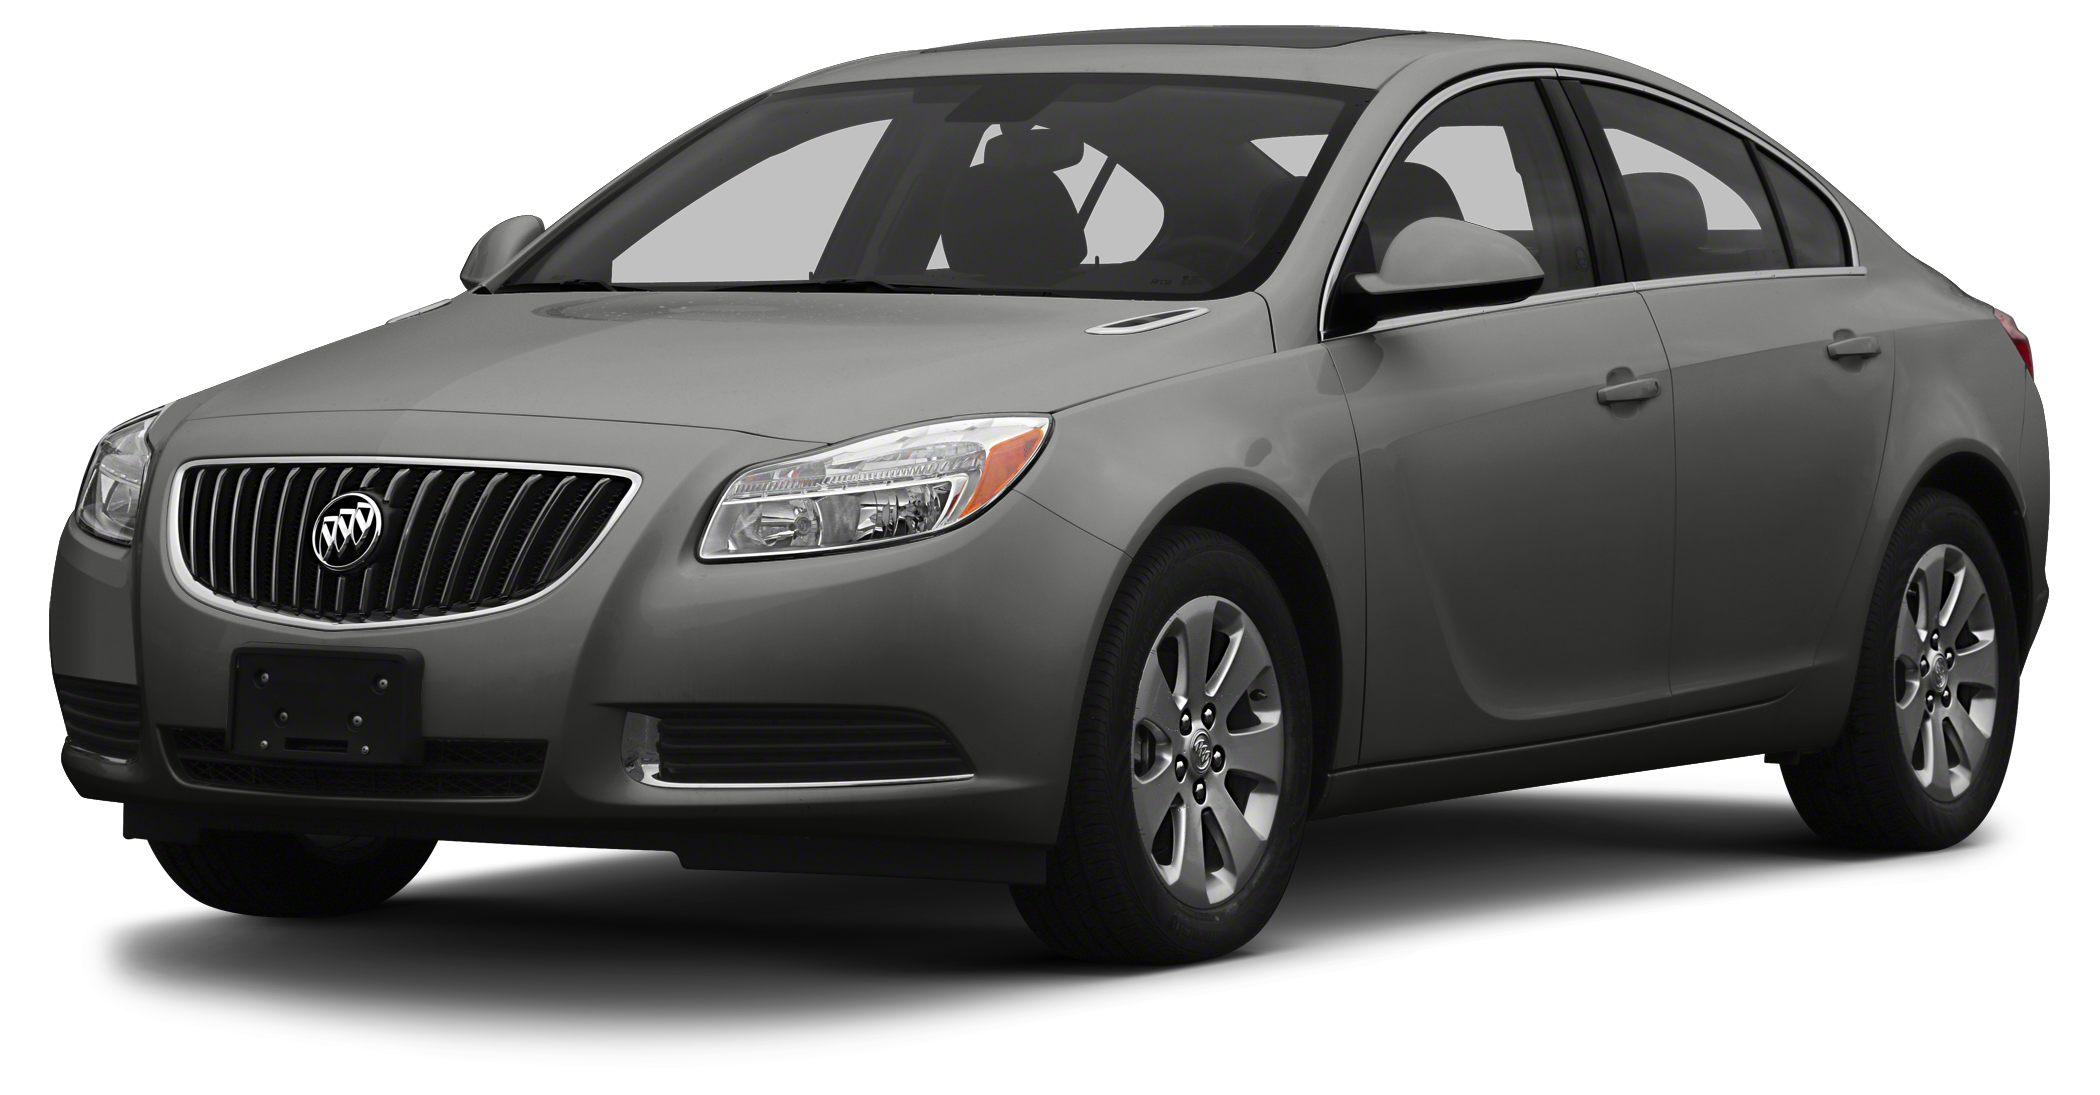 2013 Buick Regal Turbo - Premium 1 Miles 68187Color Smoky Gray Metallic Stock 181403 VIN 2G4